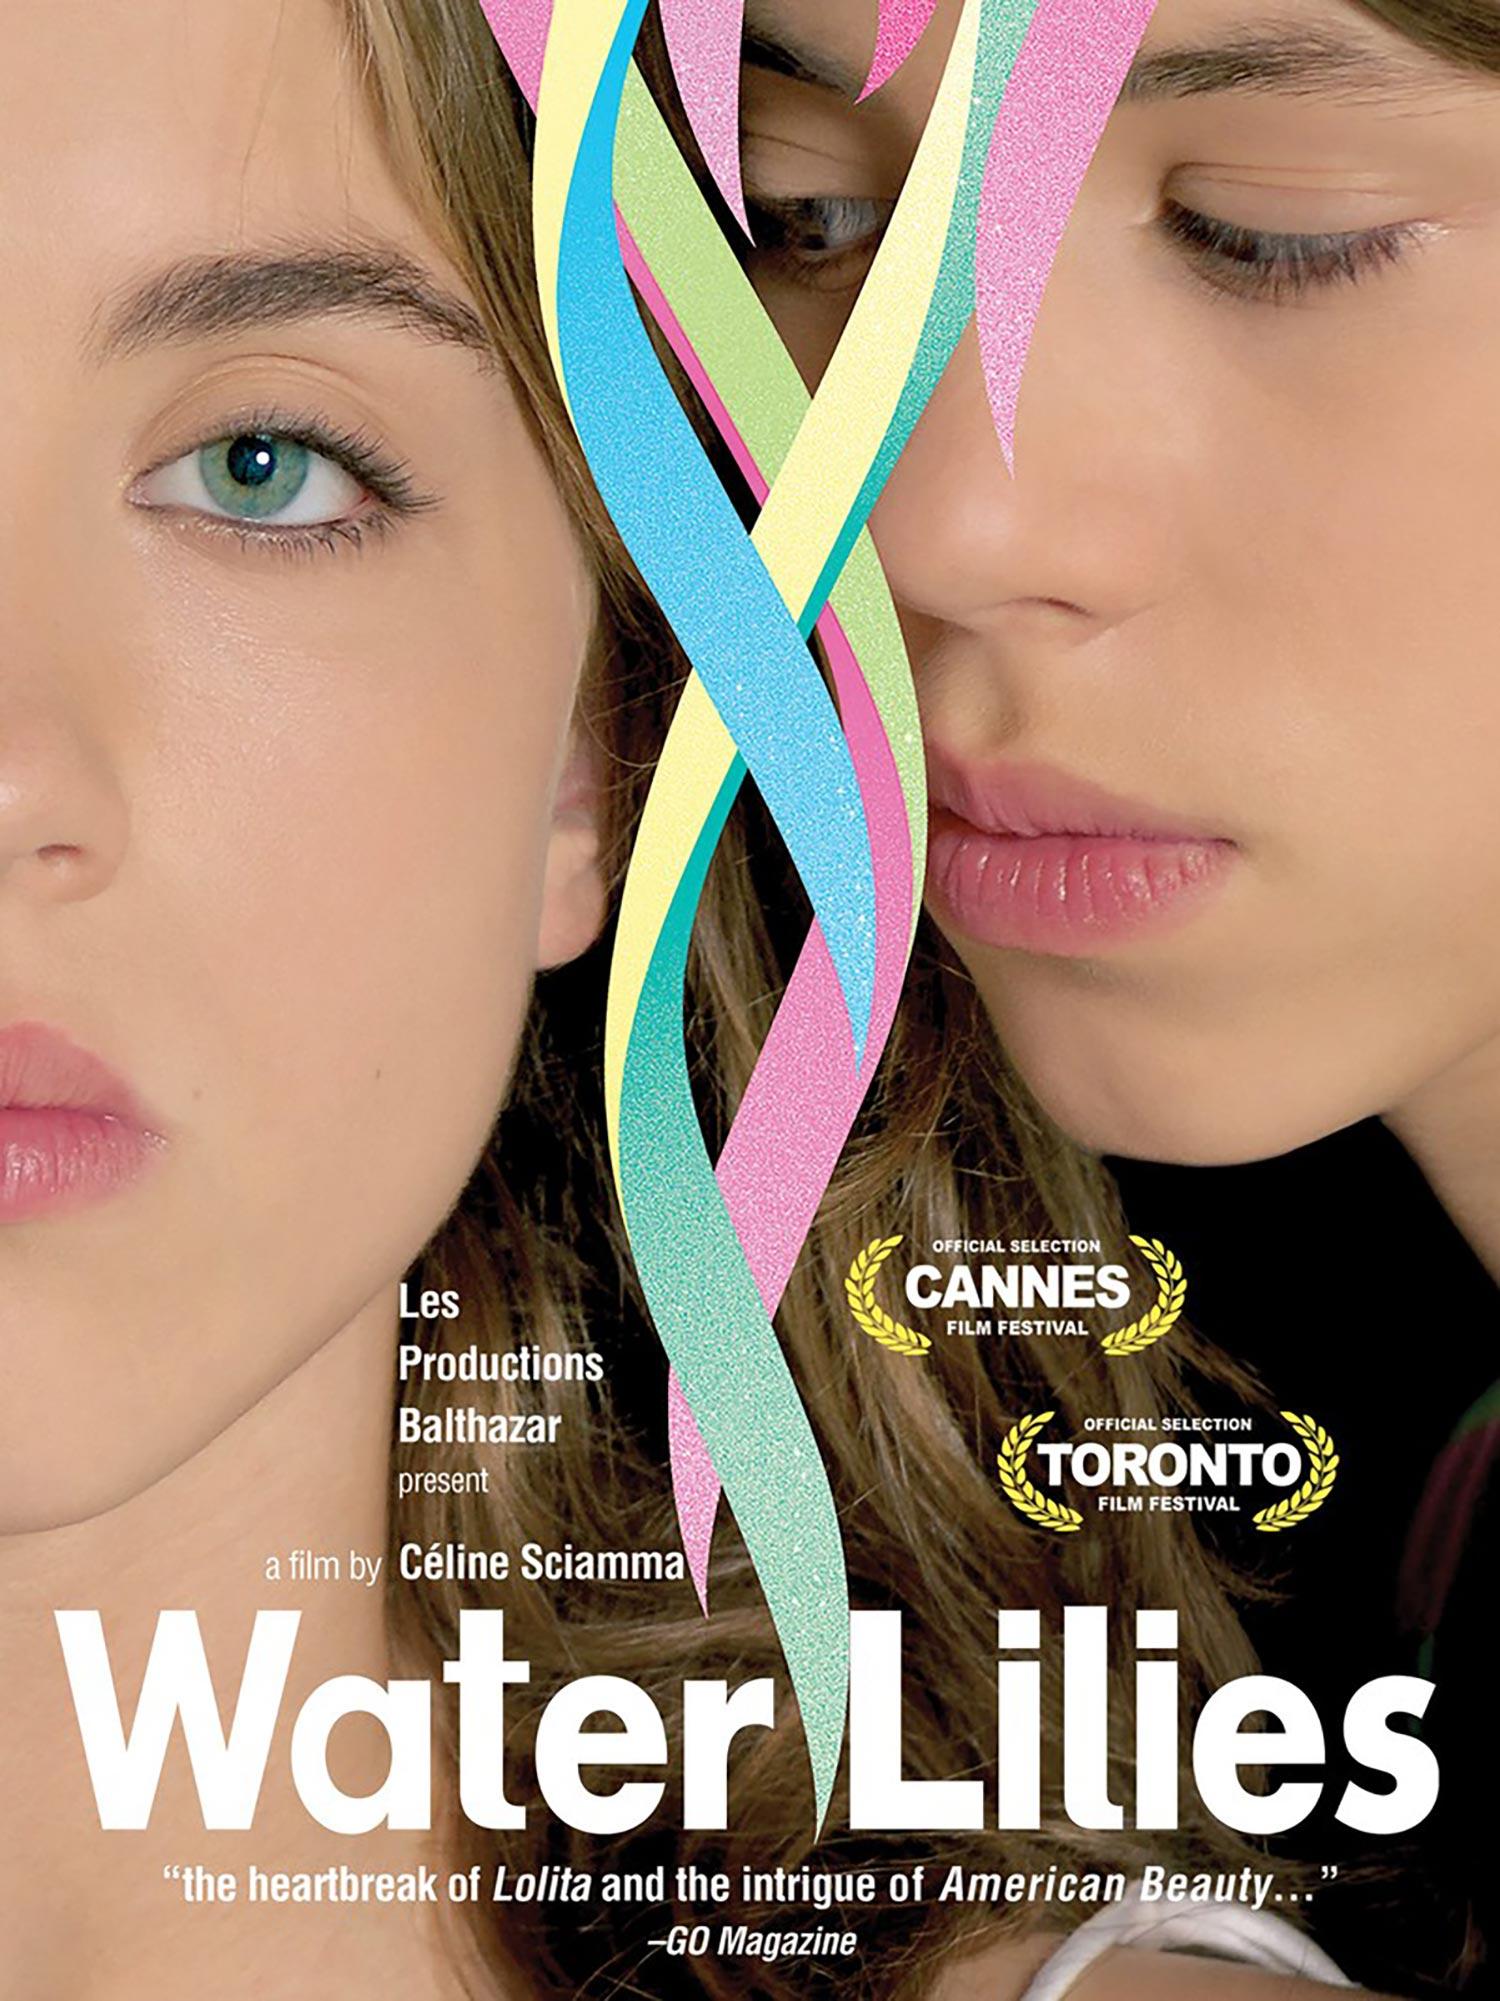 Dn Lff07 Water Lilies - Cline Sciamma  Directors Notes-4537